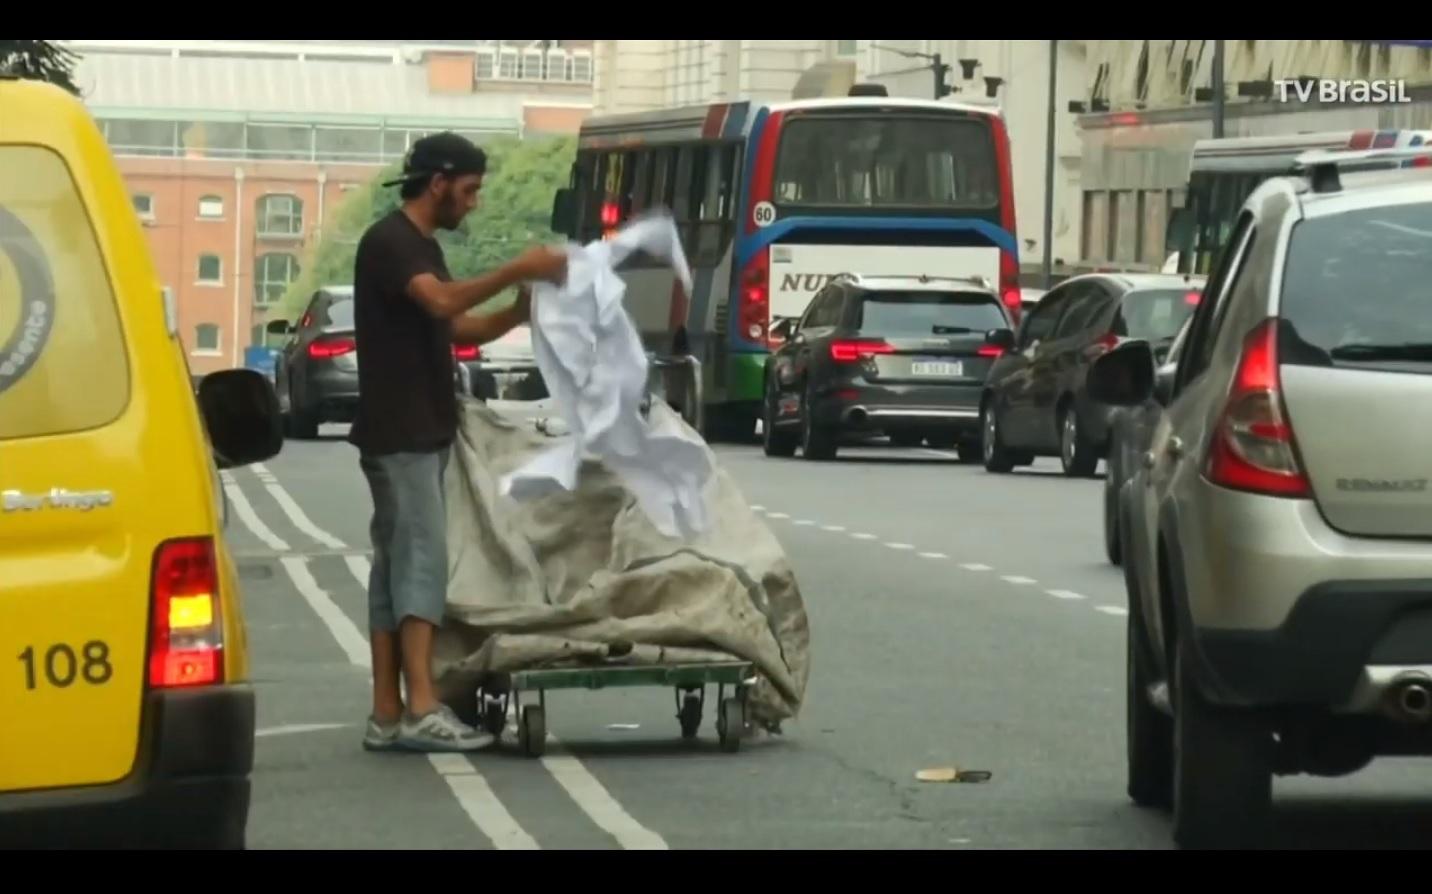 Pobreza na Argentina aumenta devido à crise econômica